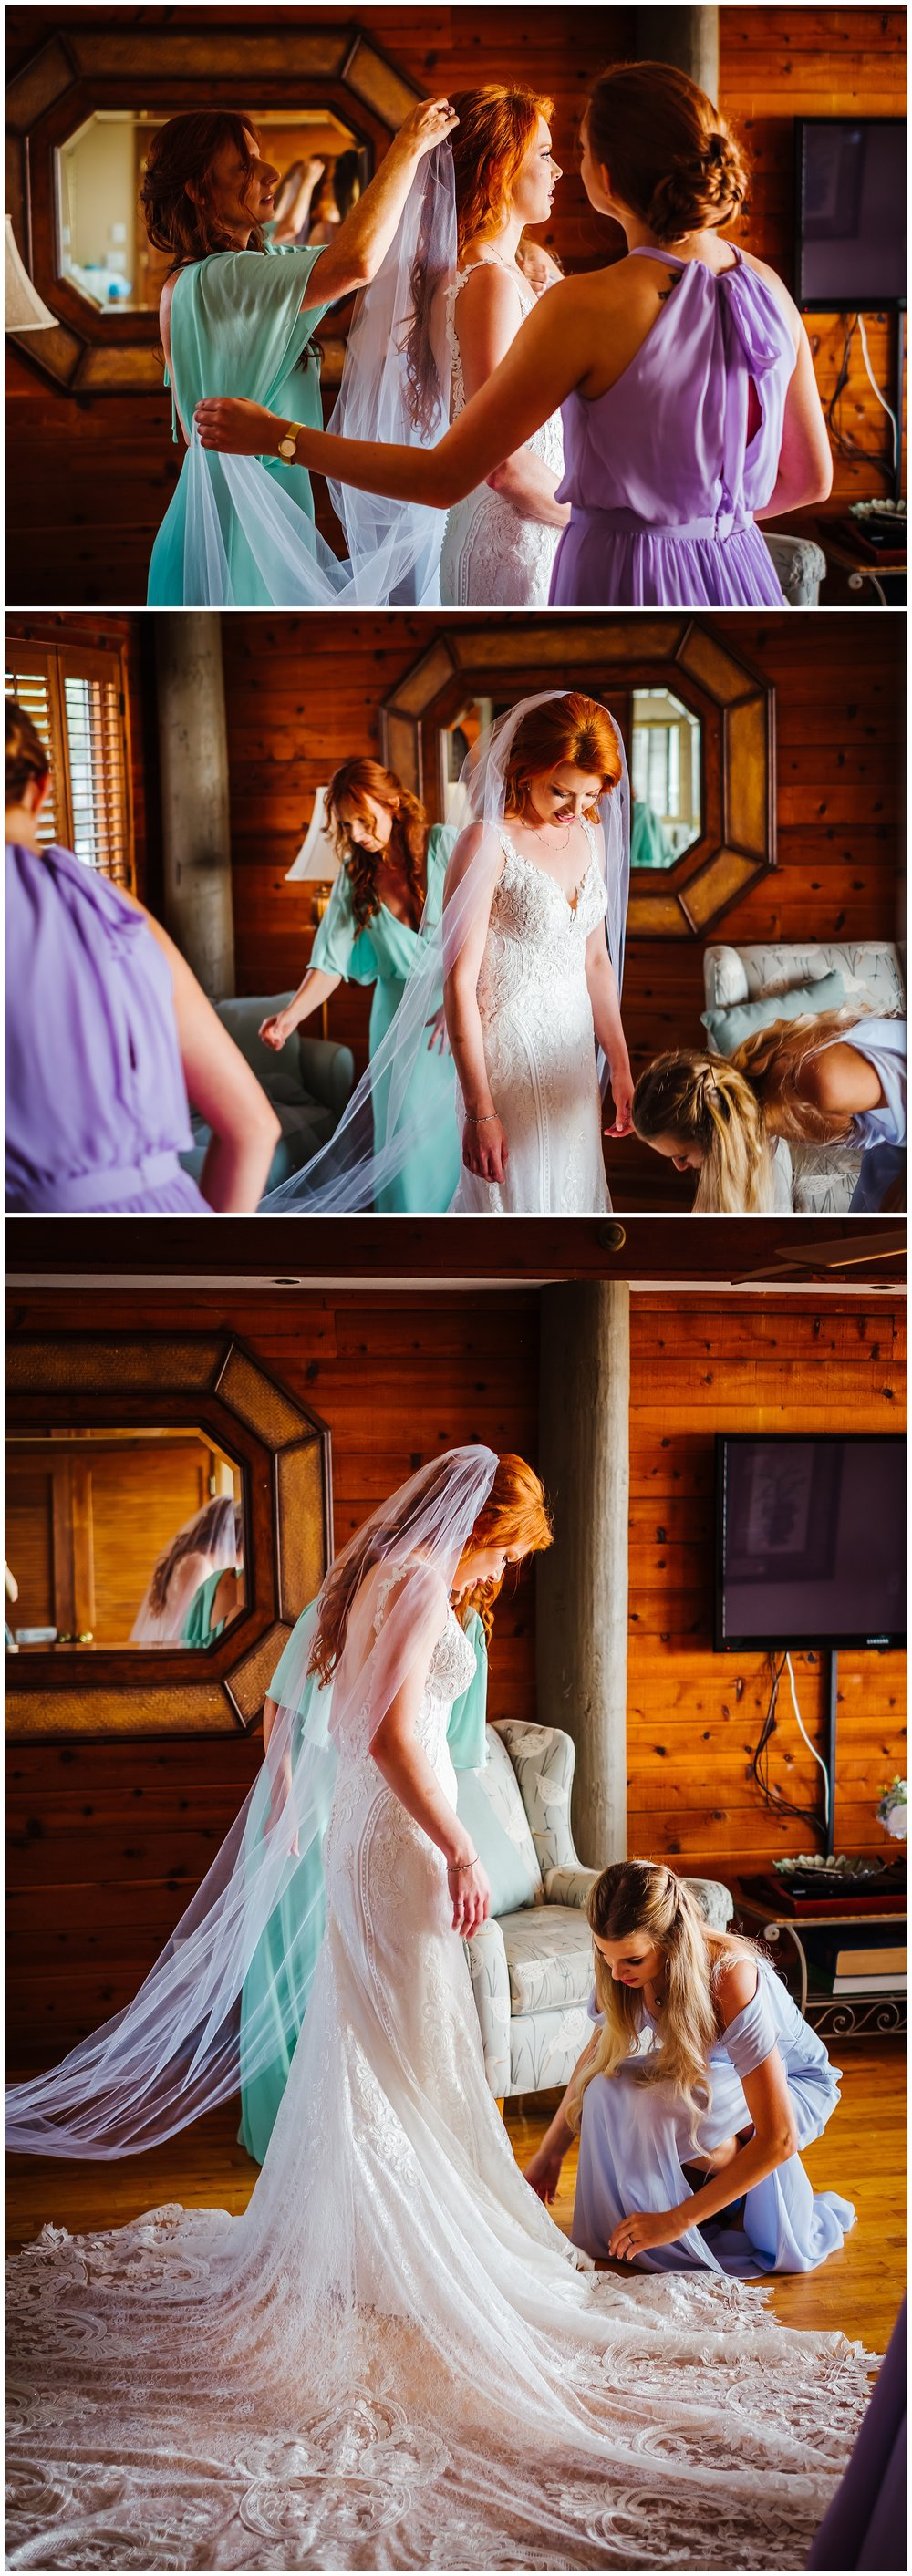 tampa-st-pete-wedding-photographer-indian-rocks-beach-mermaid-train-redhead_0107.jpg